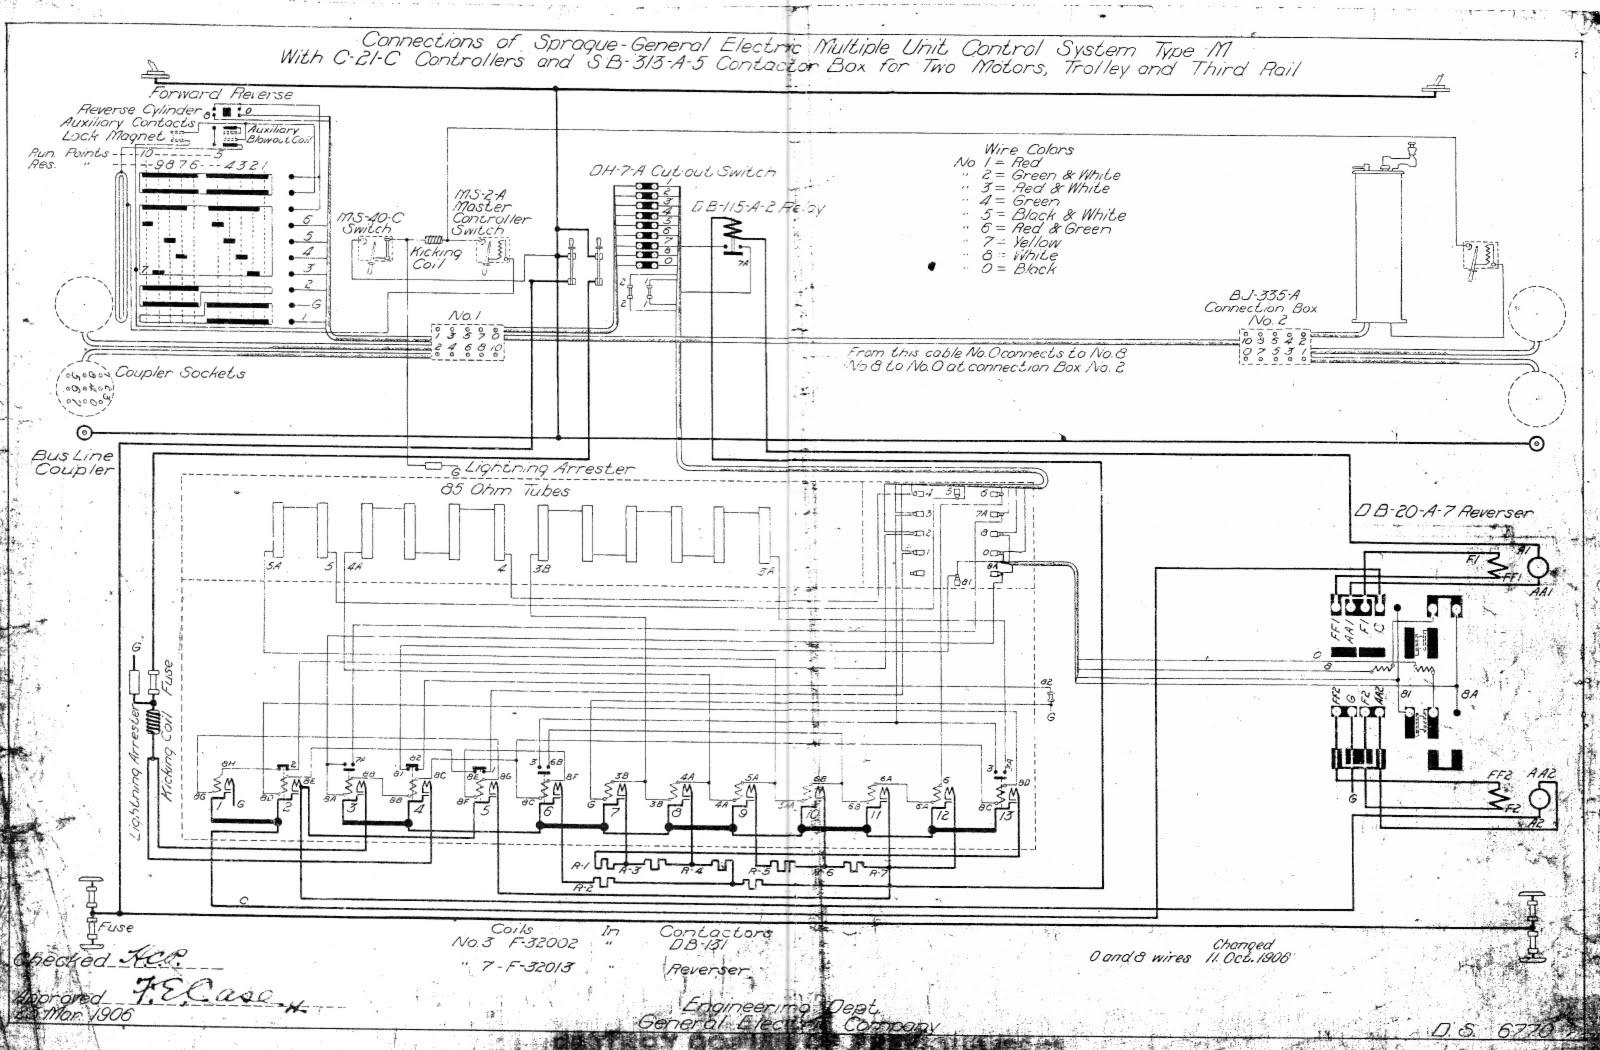 hight resolution of 1984 dodge 318 ignition wiring diagram wiring library diagram on dodge durango engine diagram likewise ram 1500 wiring